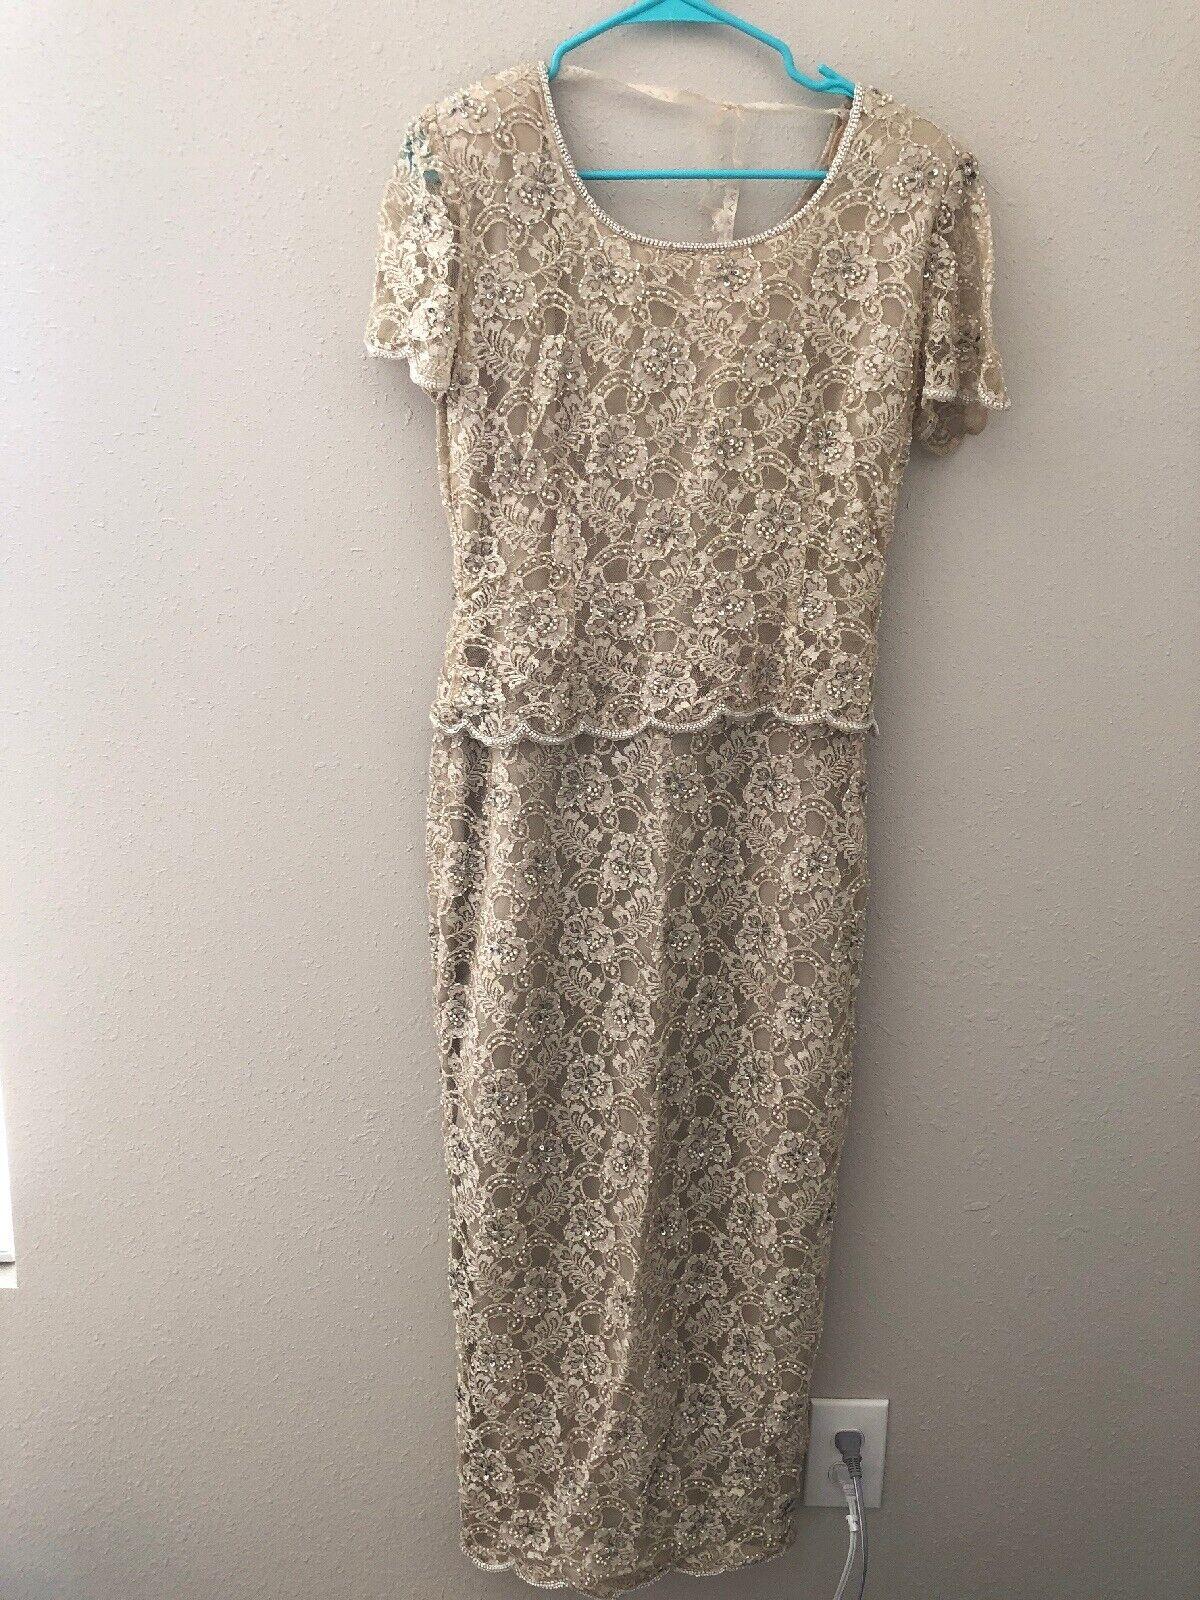 Vintage Stenay Wedding Dress 6 Sequin Floral Lace Beaded Beige